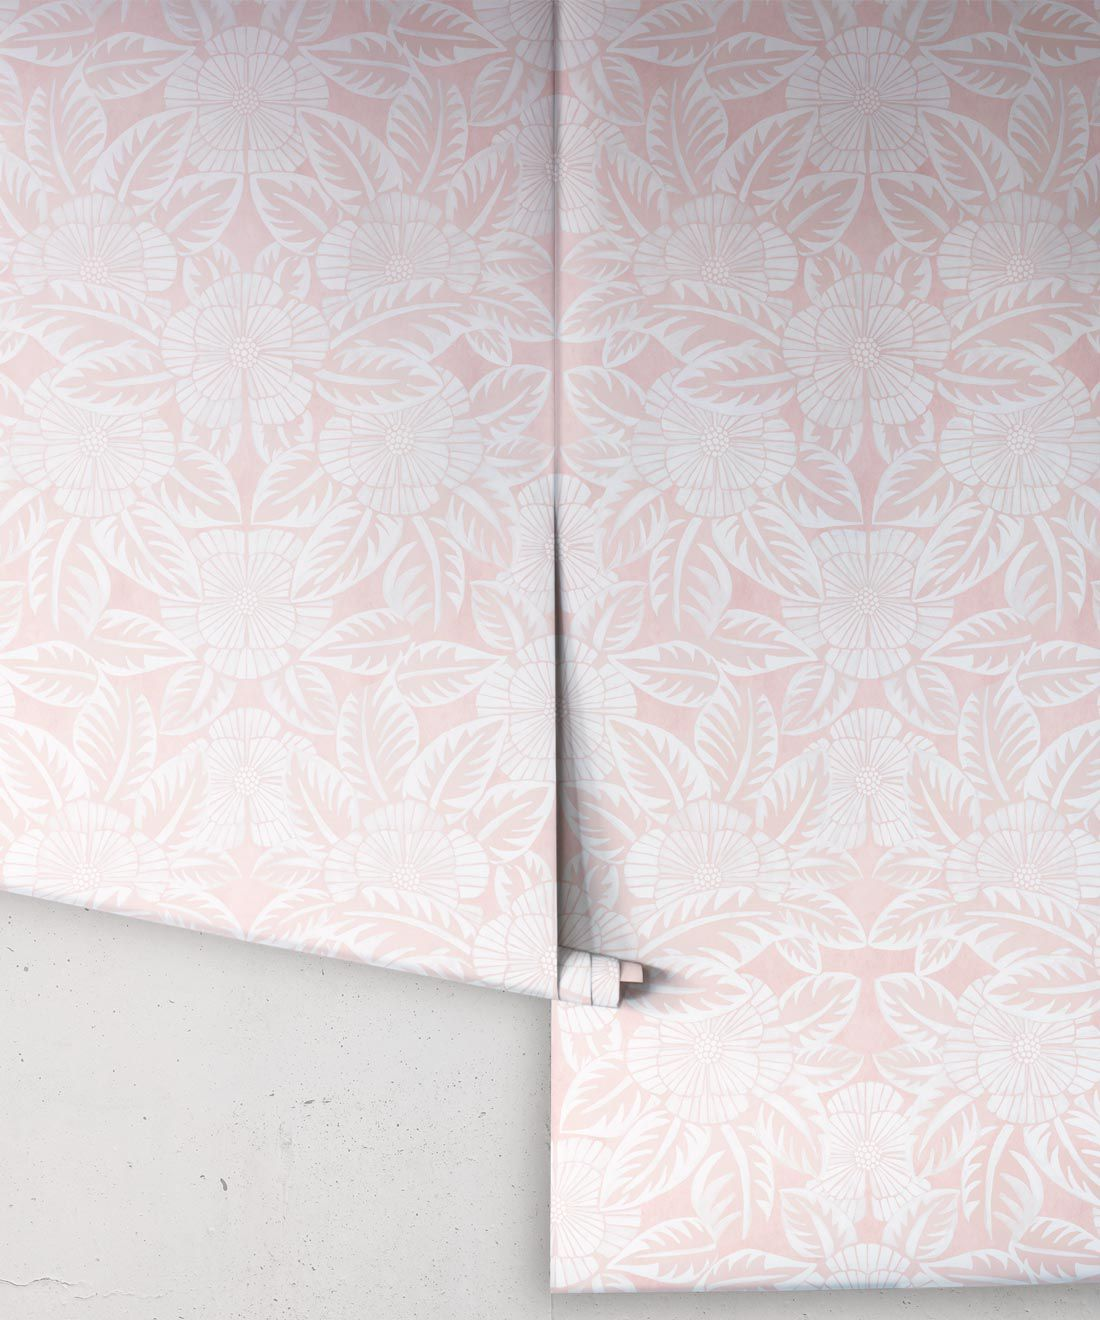 Calcutta Wallpaper • Flower and Leaf Motif Design • Ethnic Wallpaper • Pink Wallpaper • Rolls